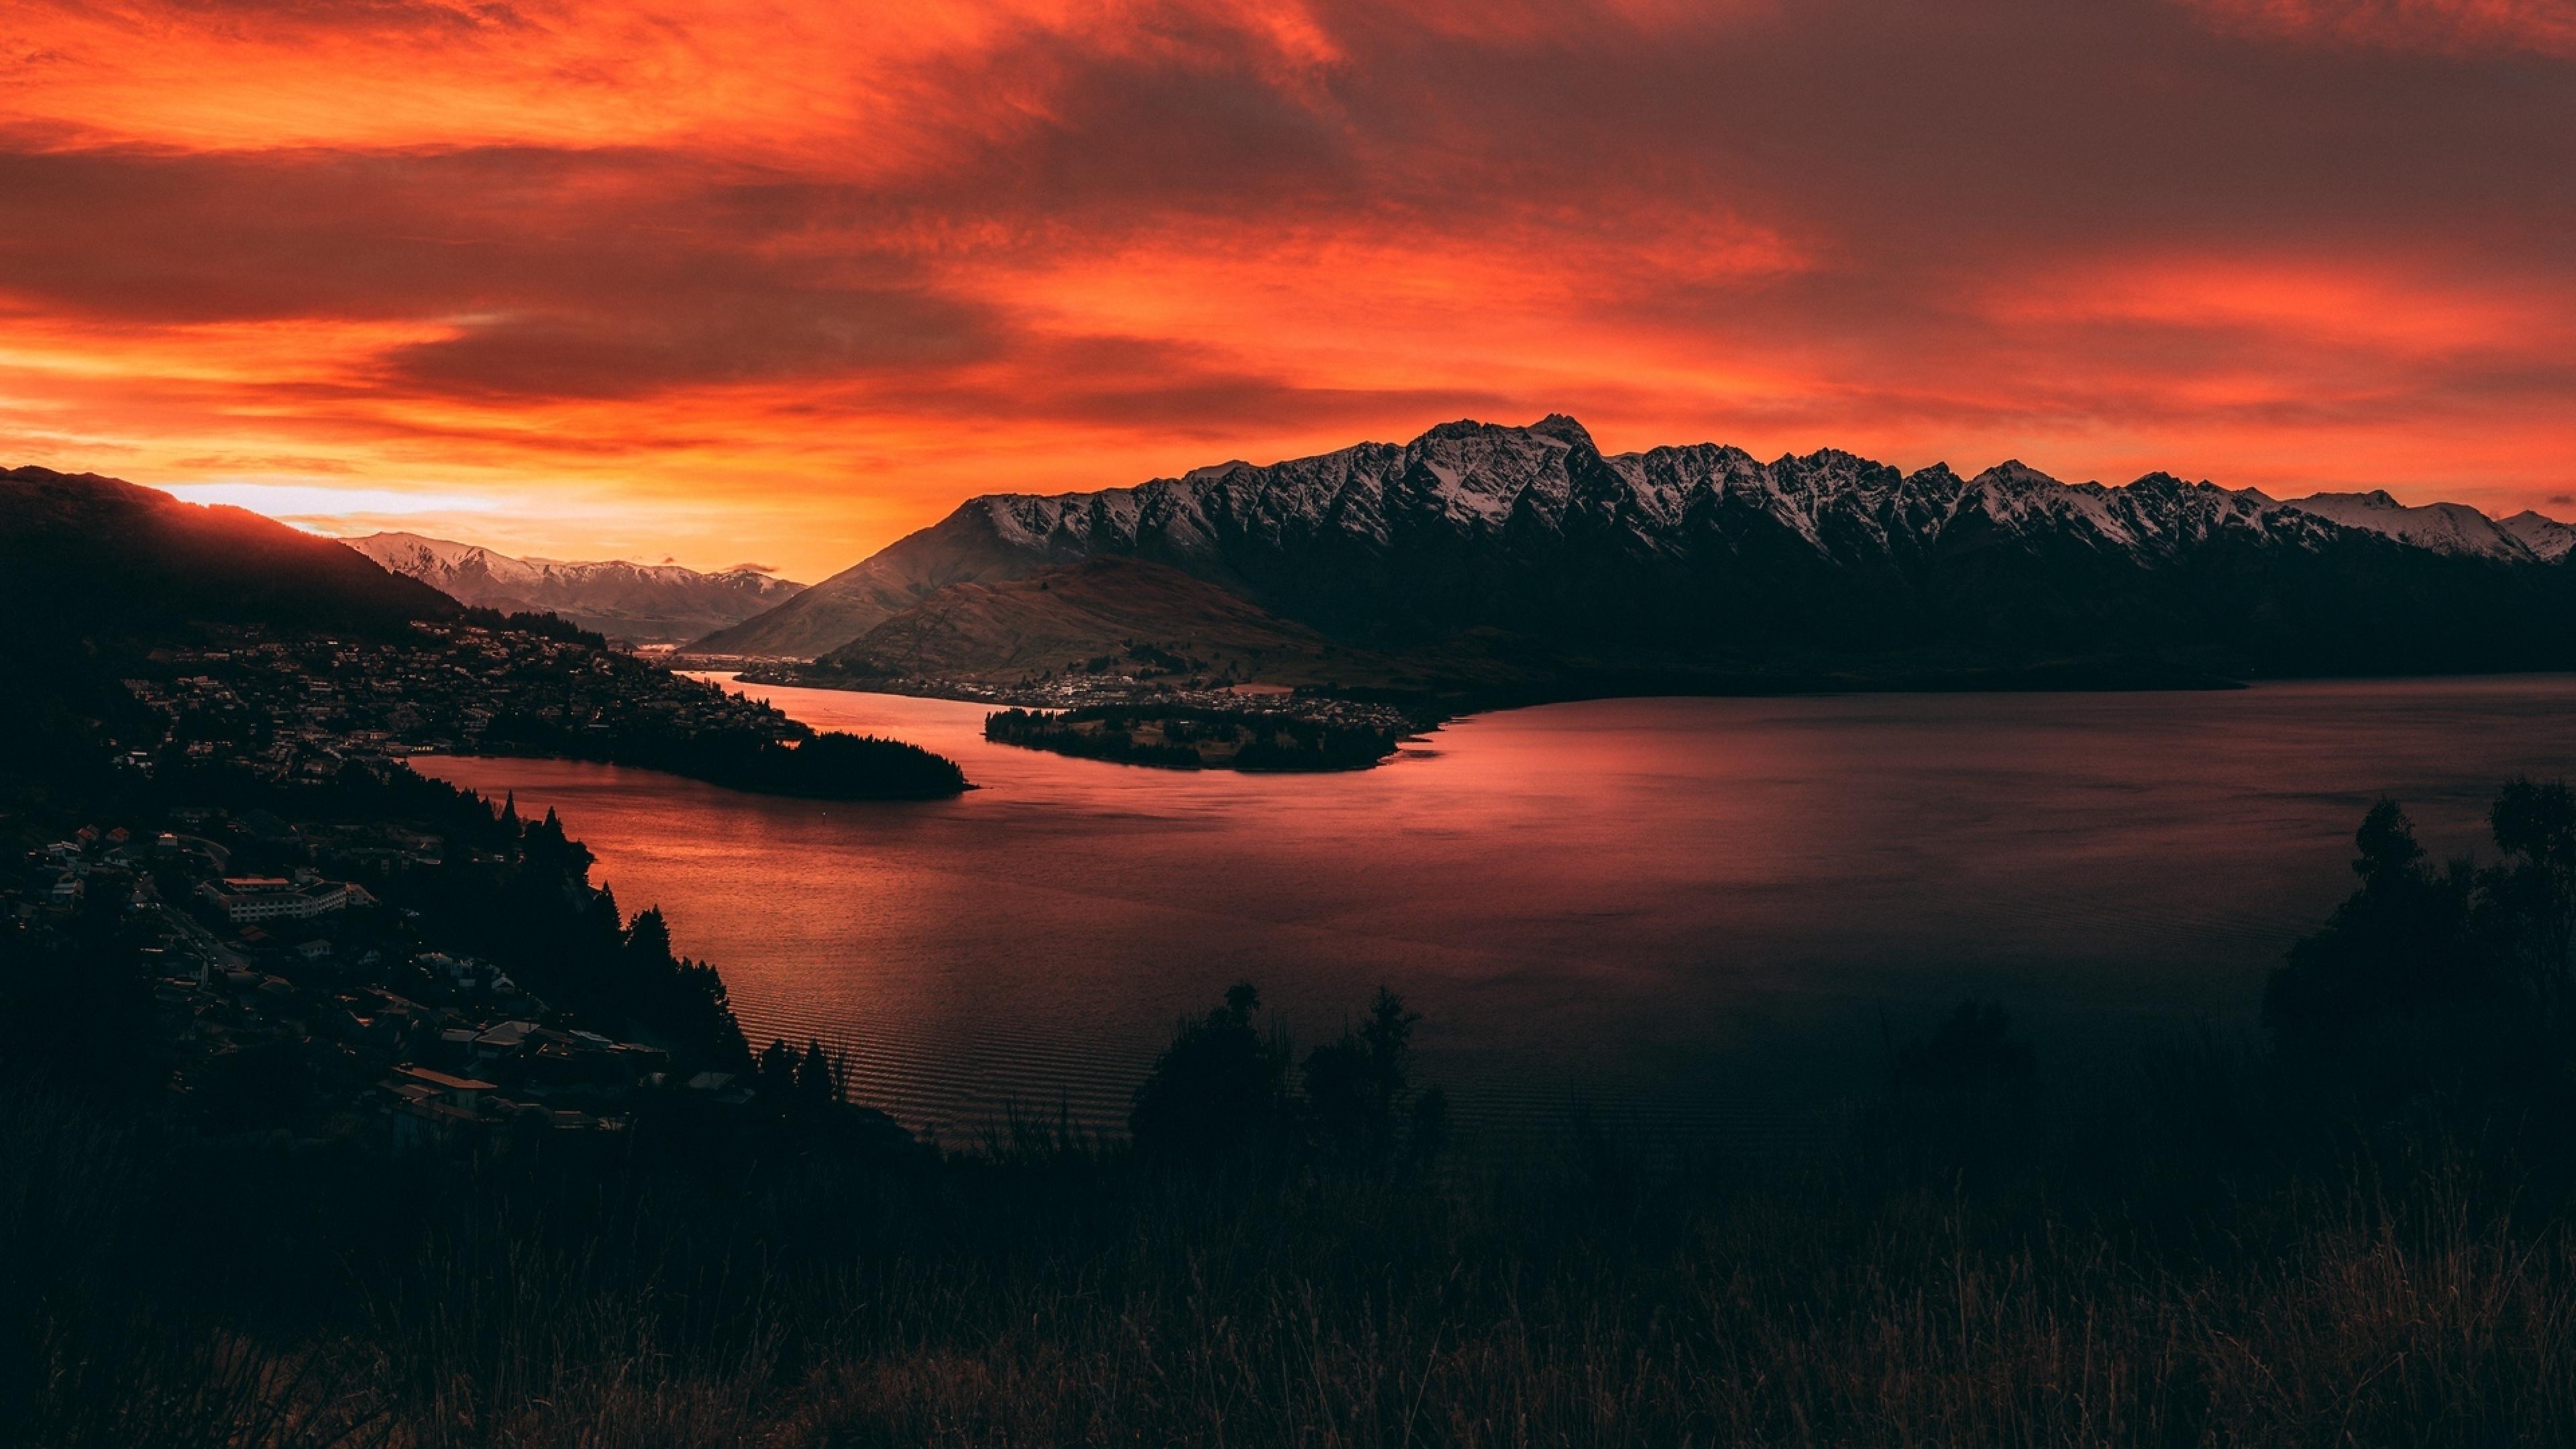 3840x2160 New Zealand Orange Mountain Sunset 4k Wallpaper